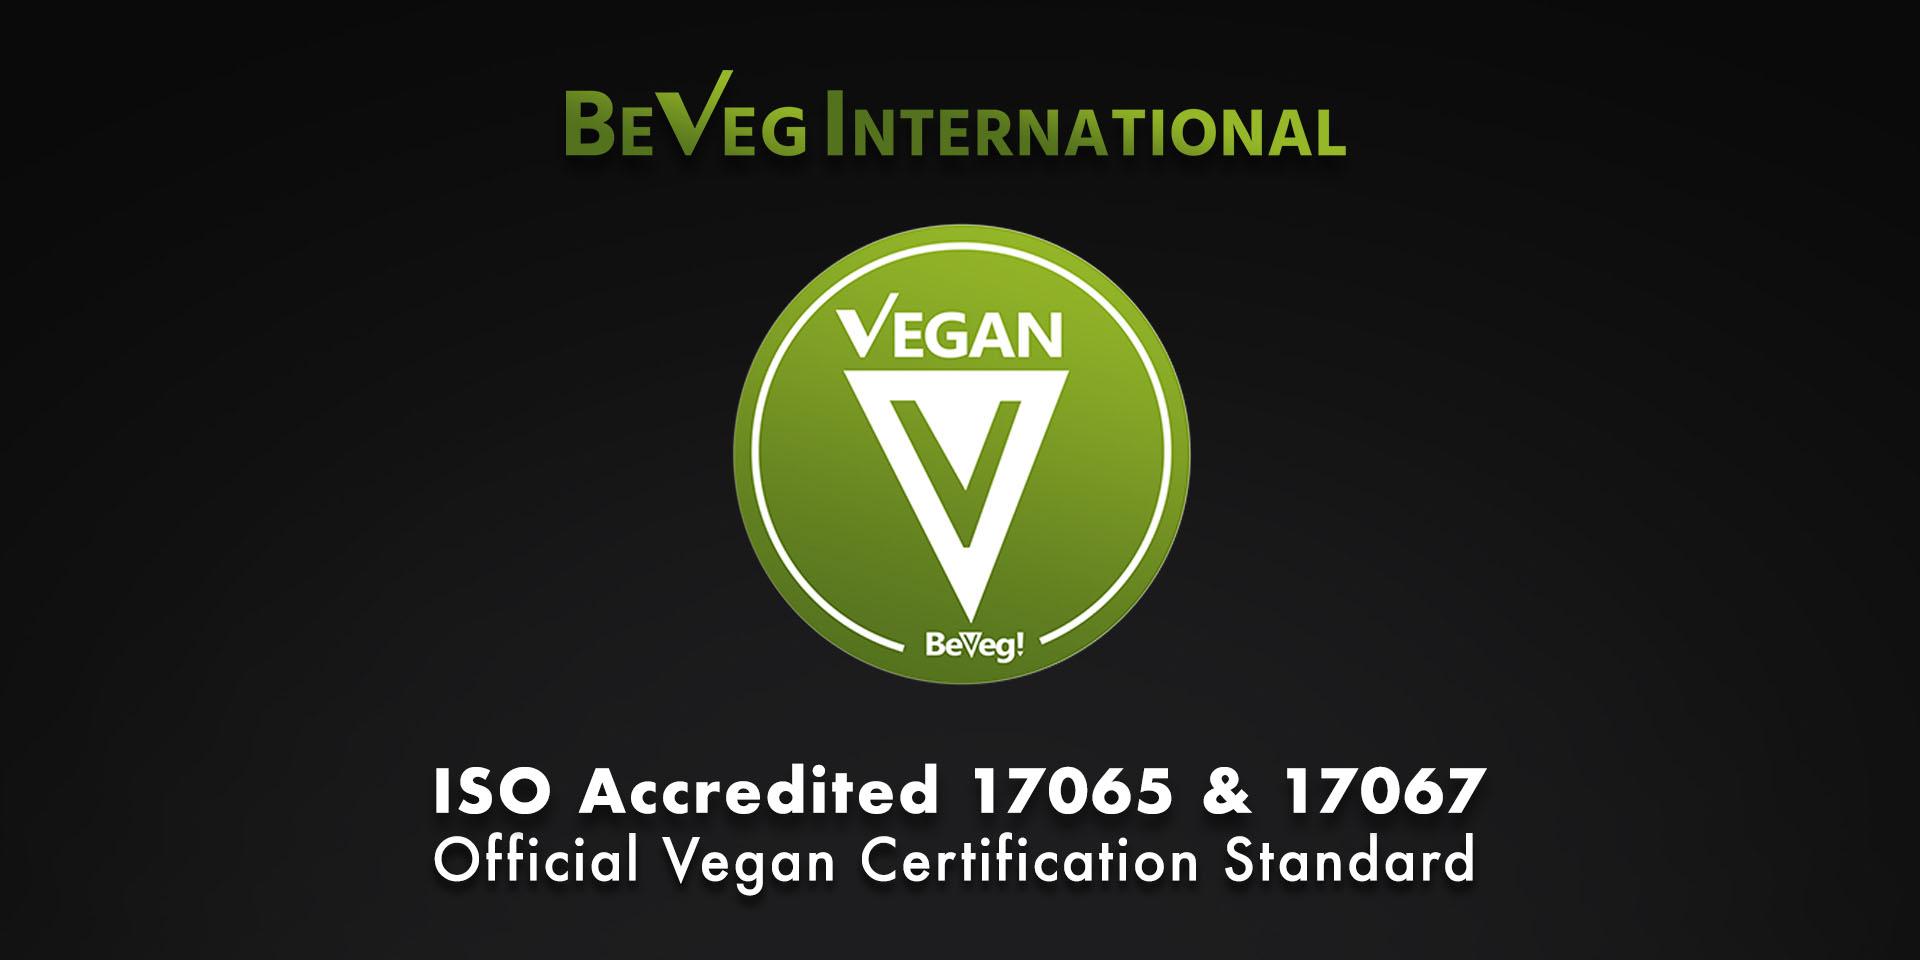 JANE UNCHAINED NEWS: Vegan Certification Firm — BeVeg — Revolutionizes Vegan Labeling Globally with ISO Accreditation